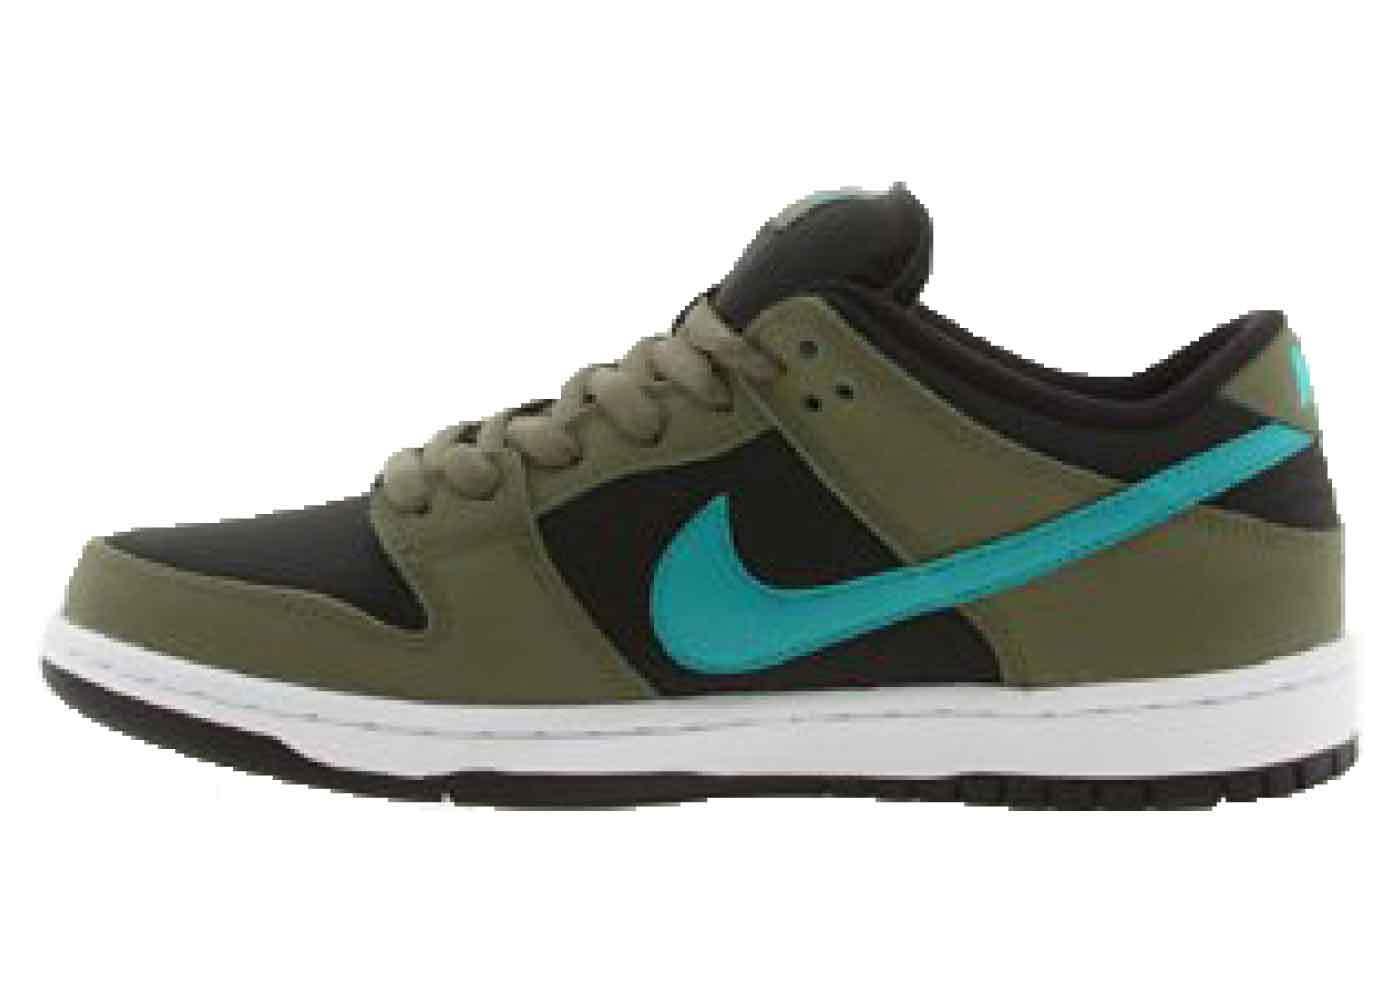 Nike SB Dunk Low Medium Olive Turbo Greenの写真